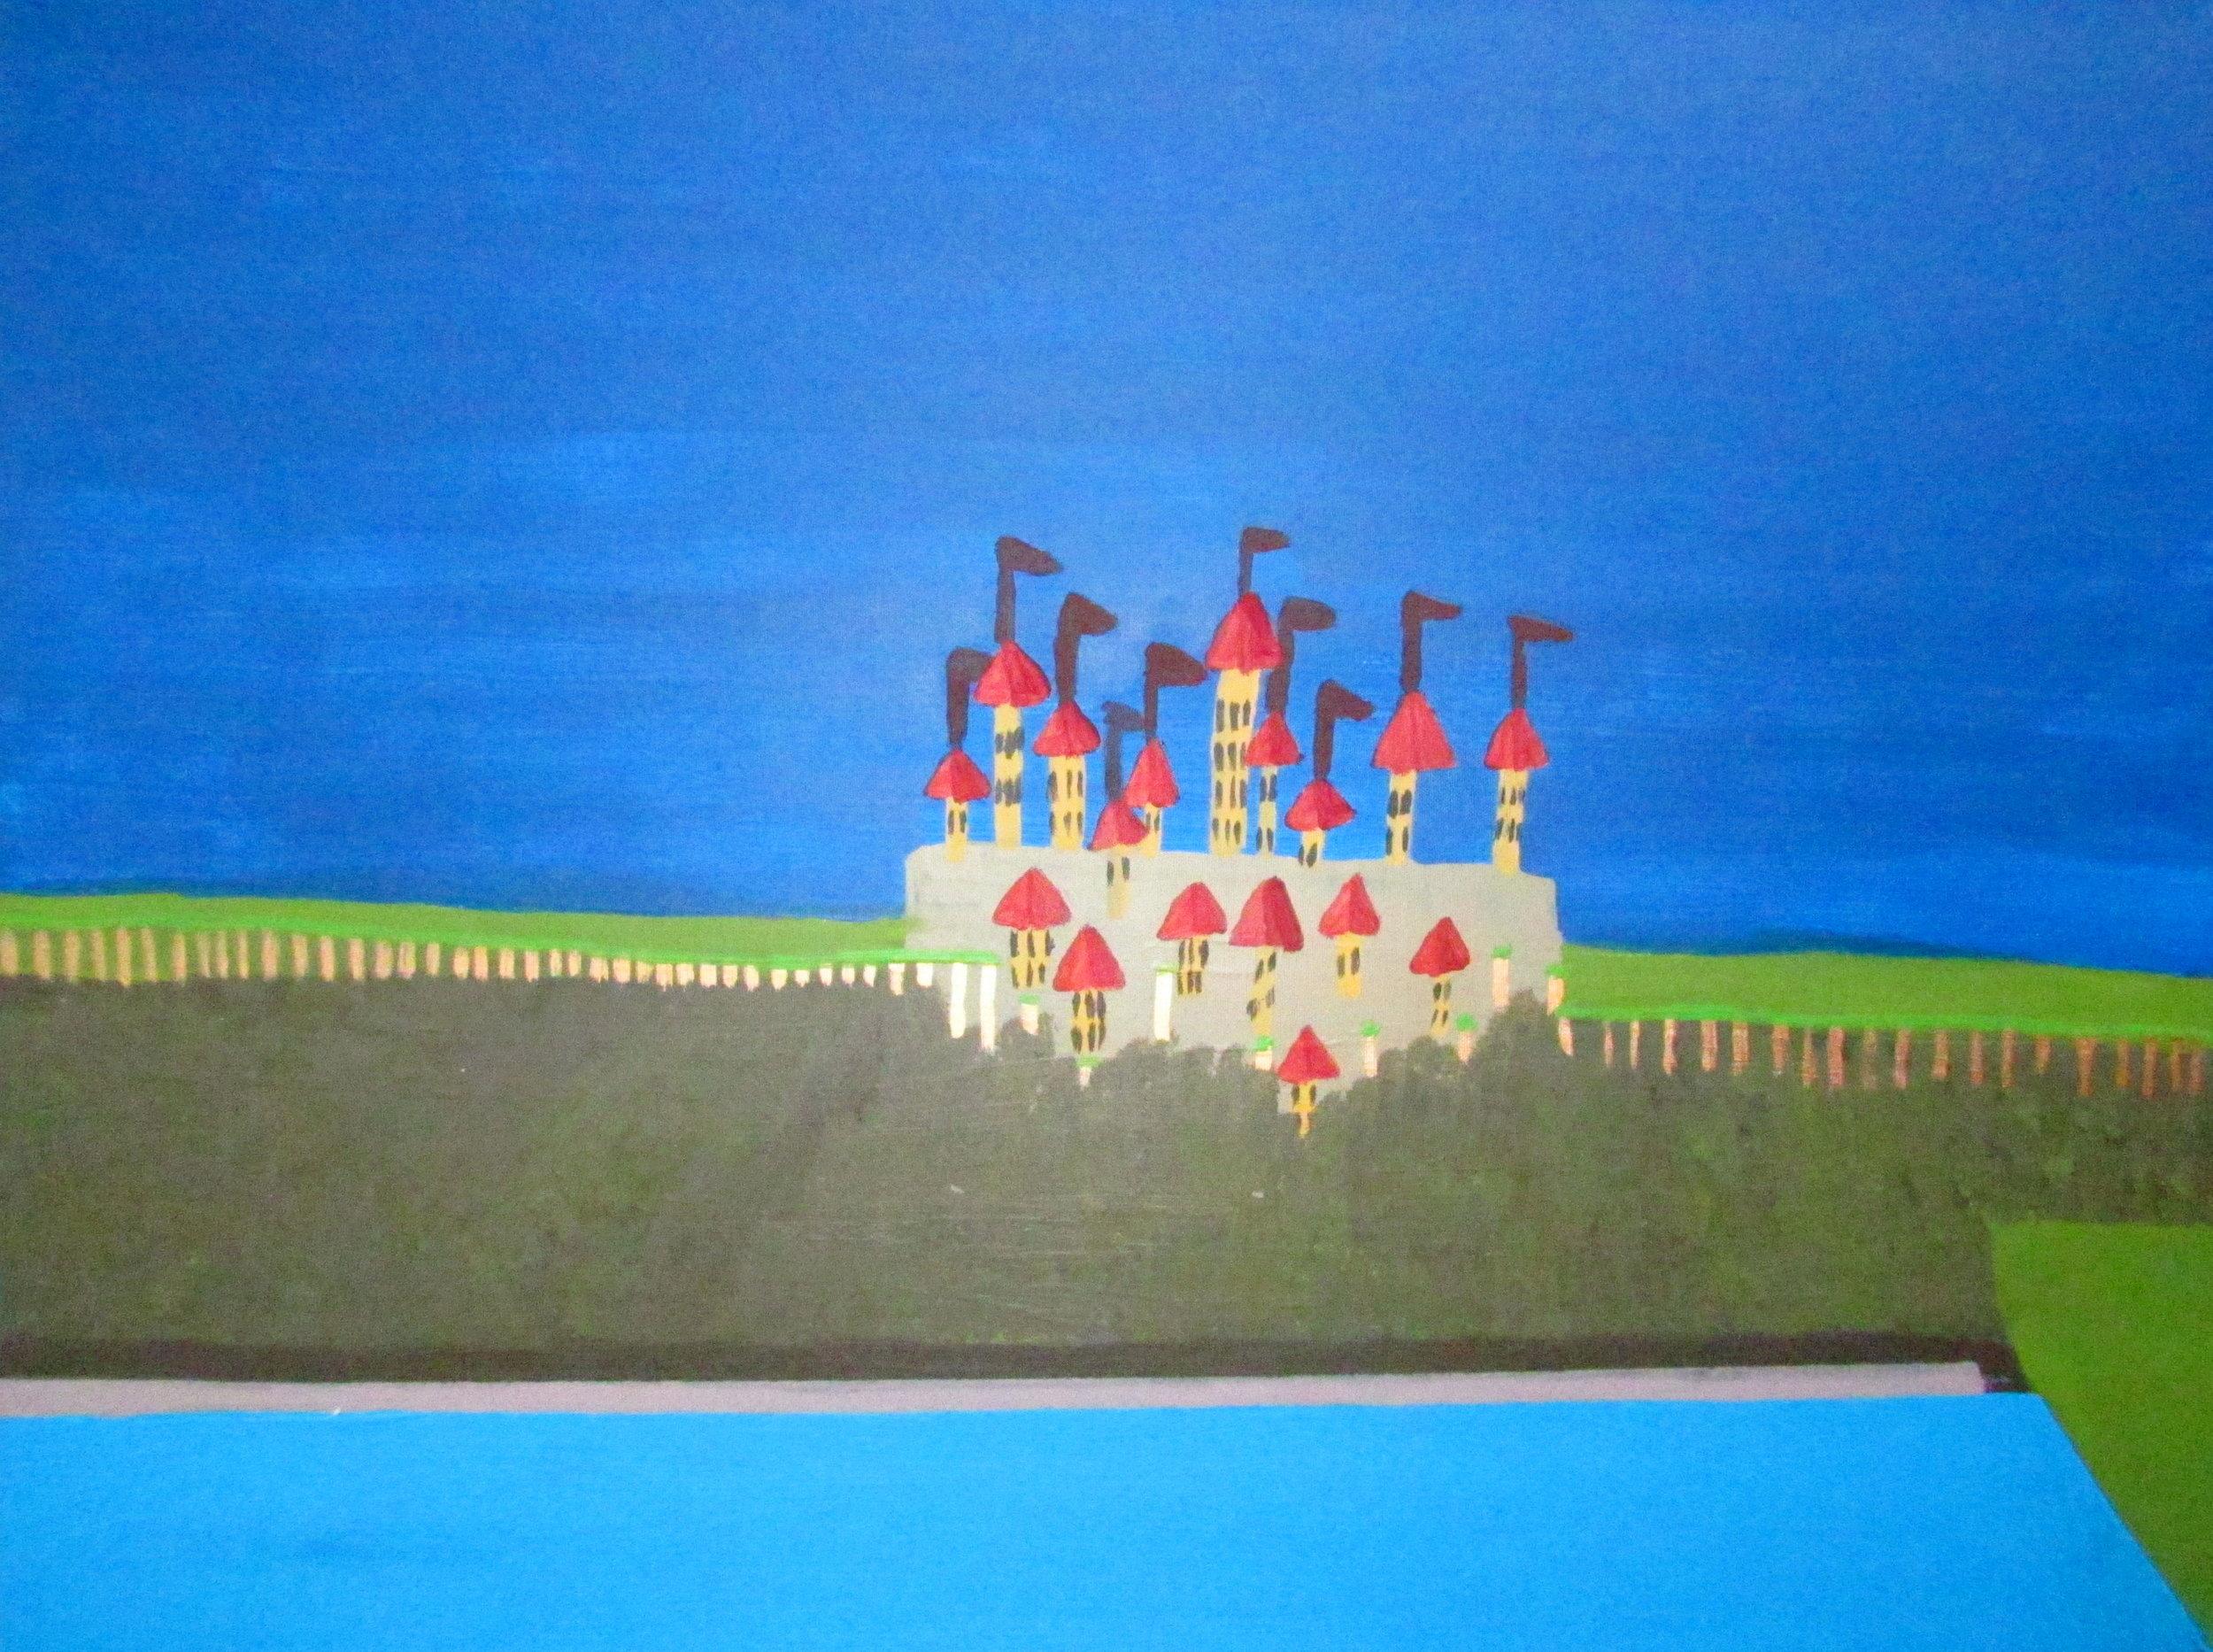 10 2016 Far far away kingdom, Acrylic on Canvas, 101 X 76cm, Yaniv Janson.JPG